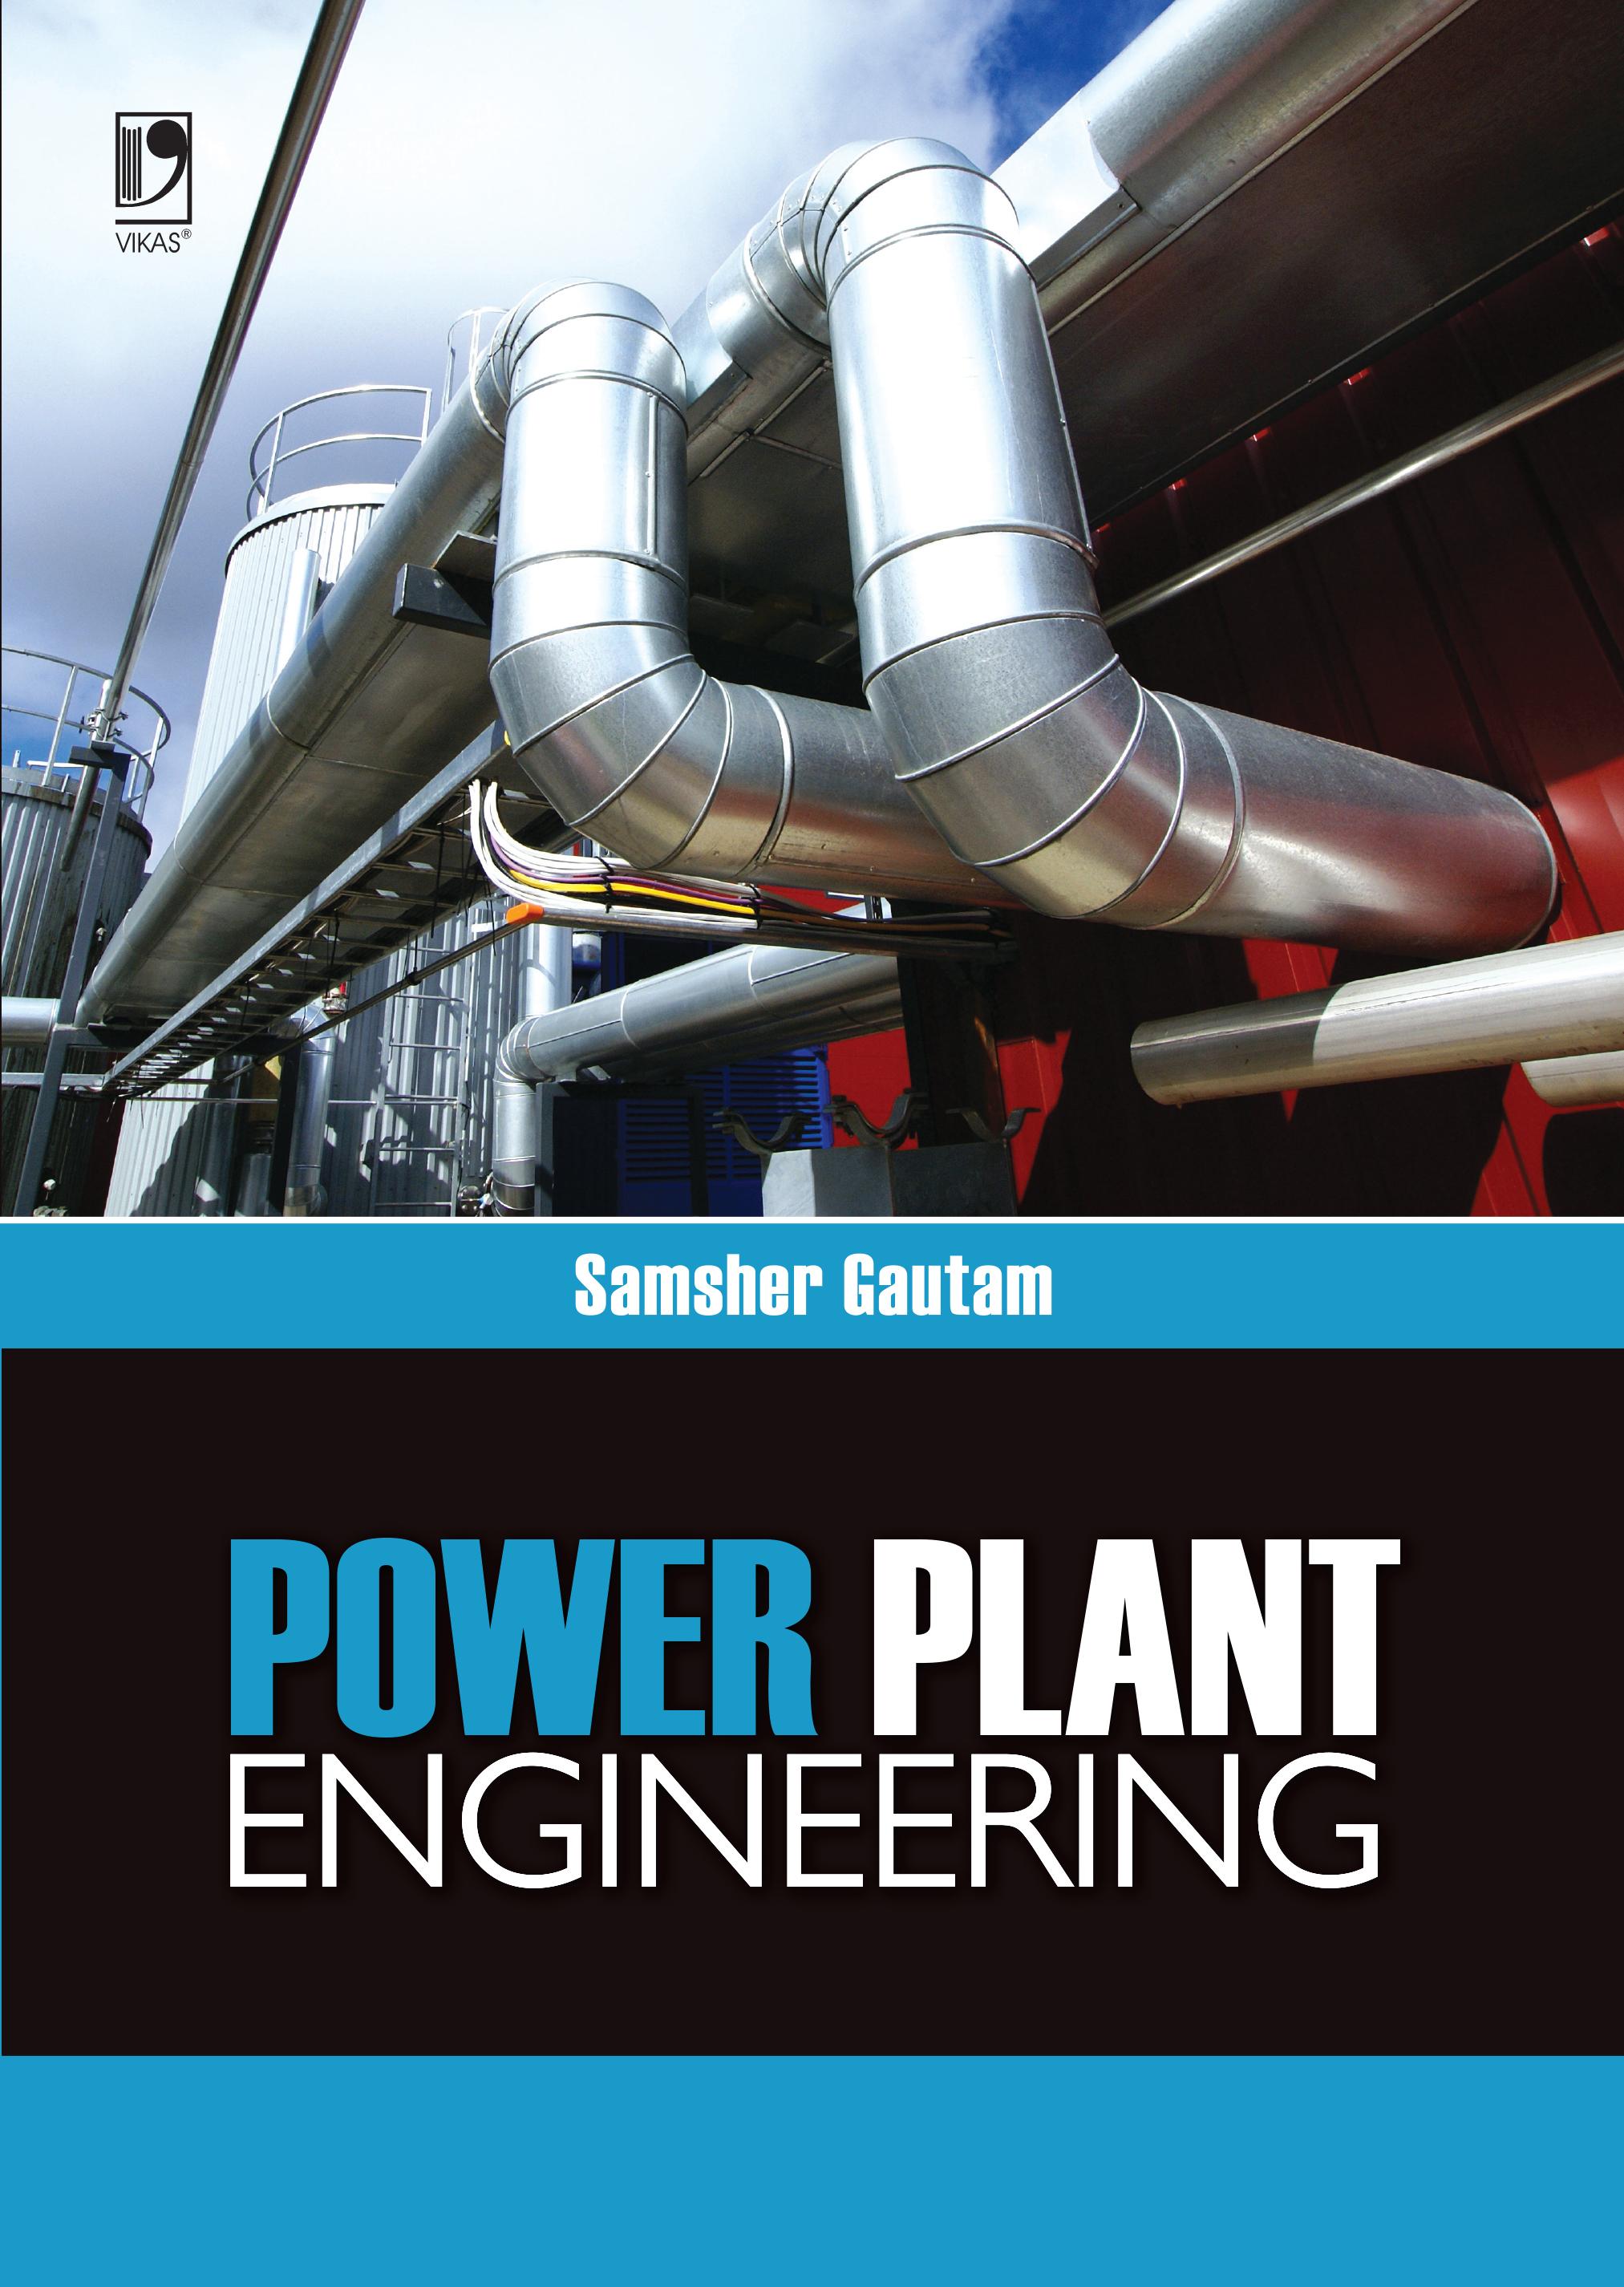 Power Plant Engineering by  Samsher Gautam